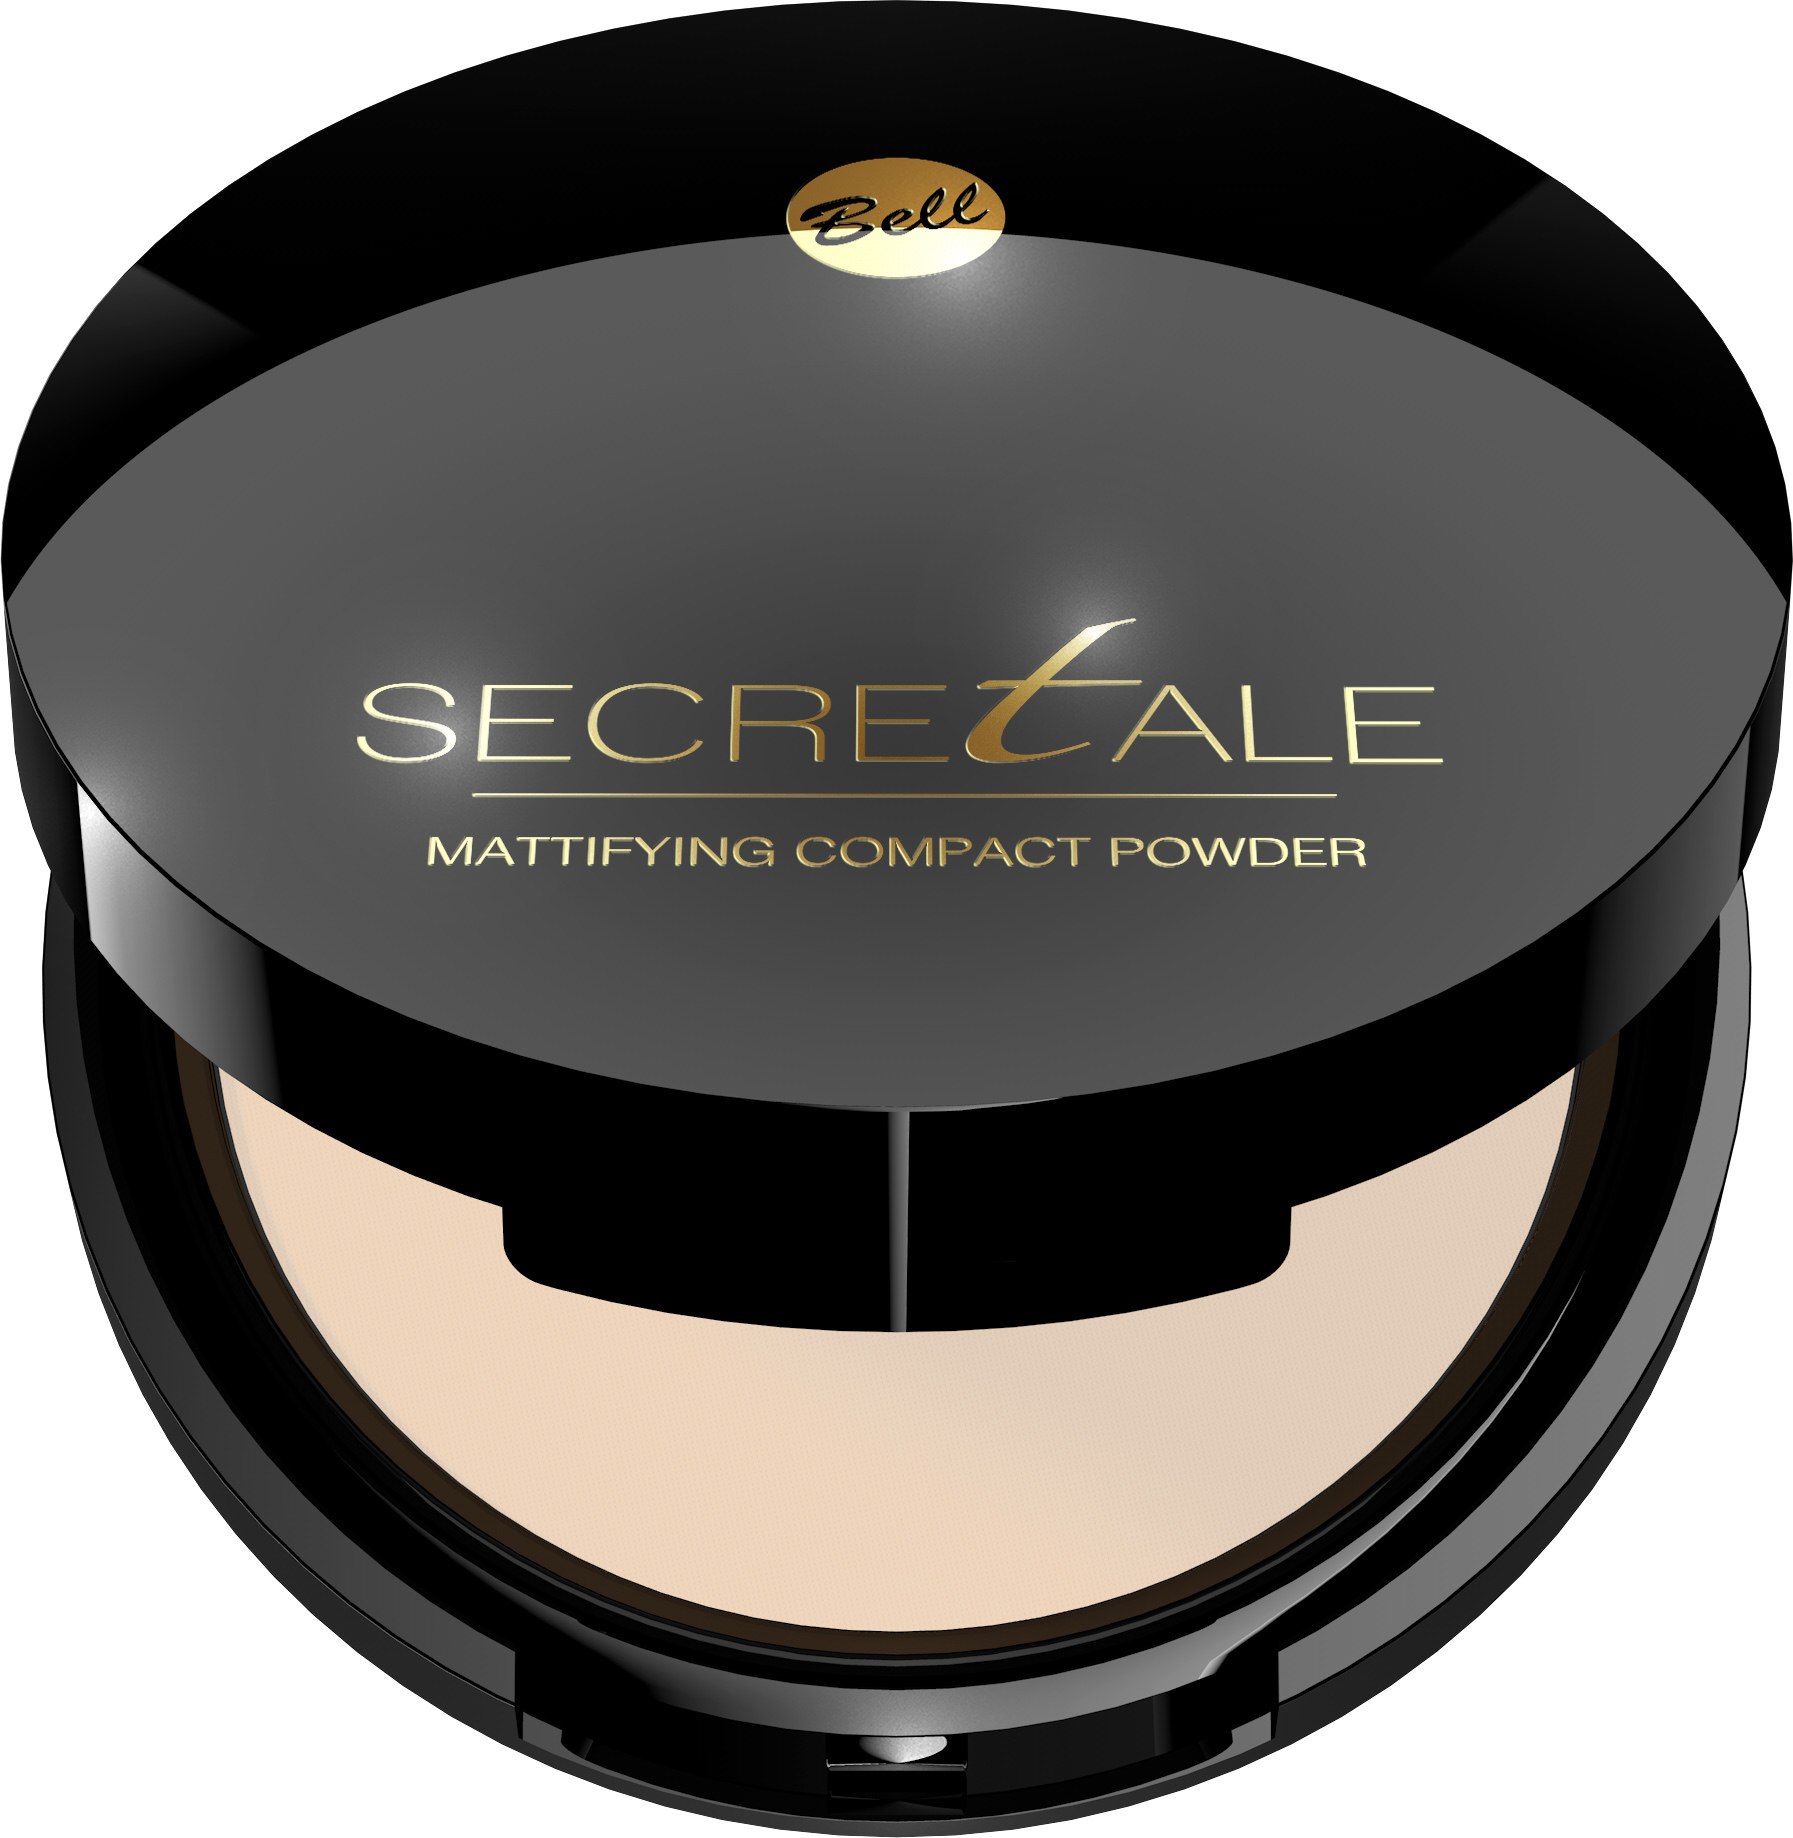 Secretale Mattifying Compact Powder